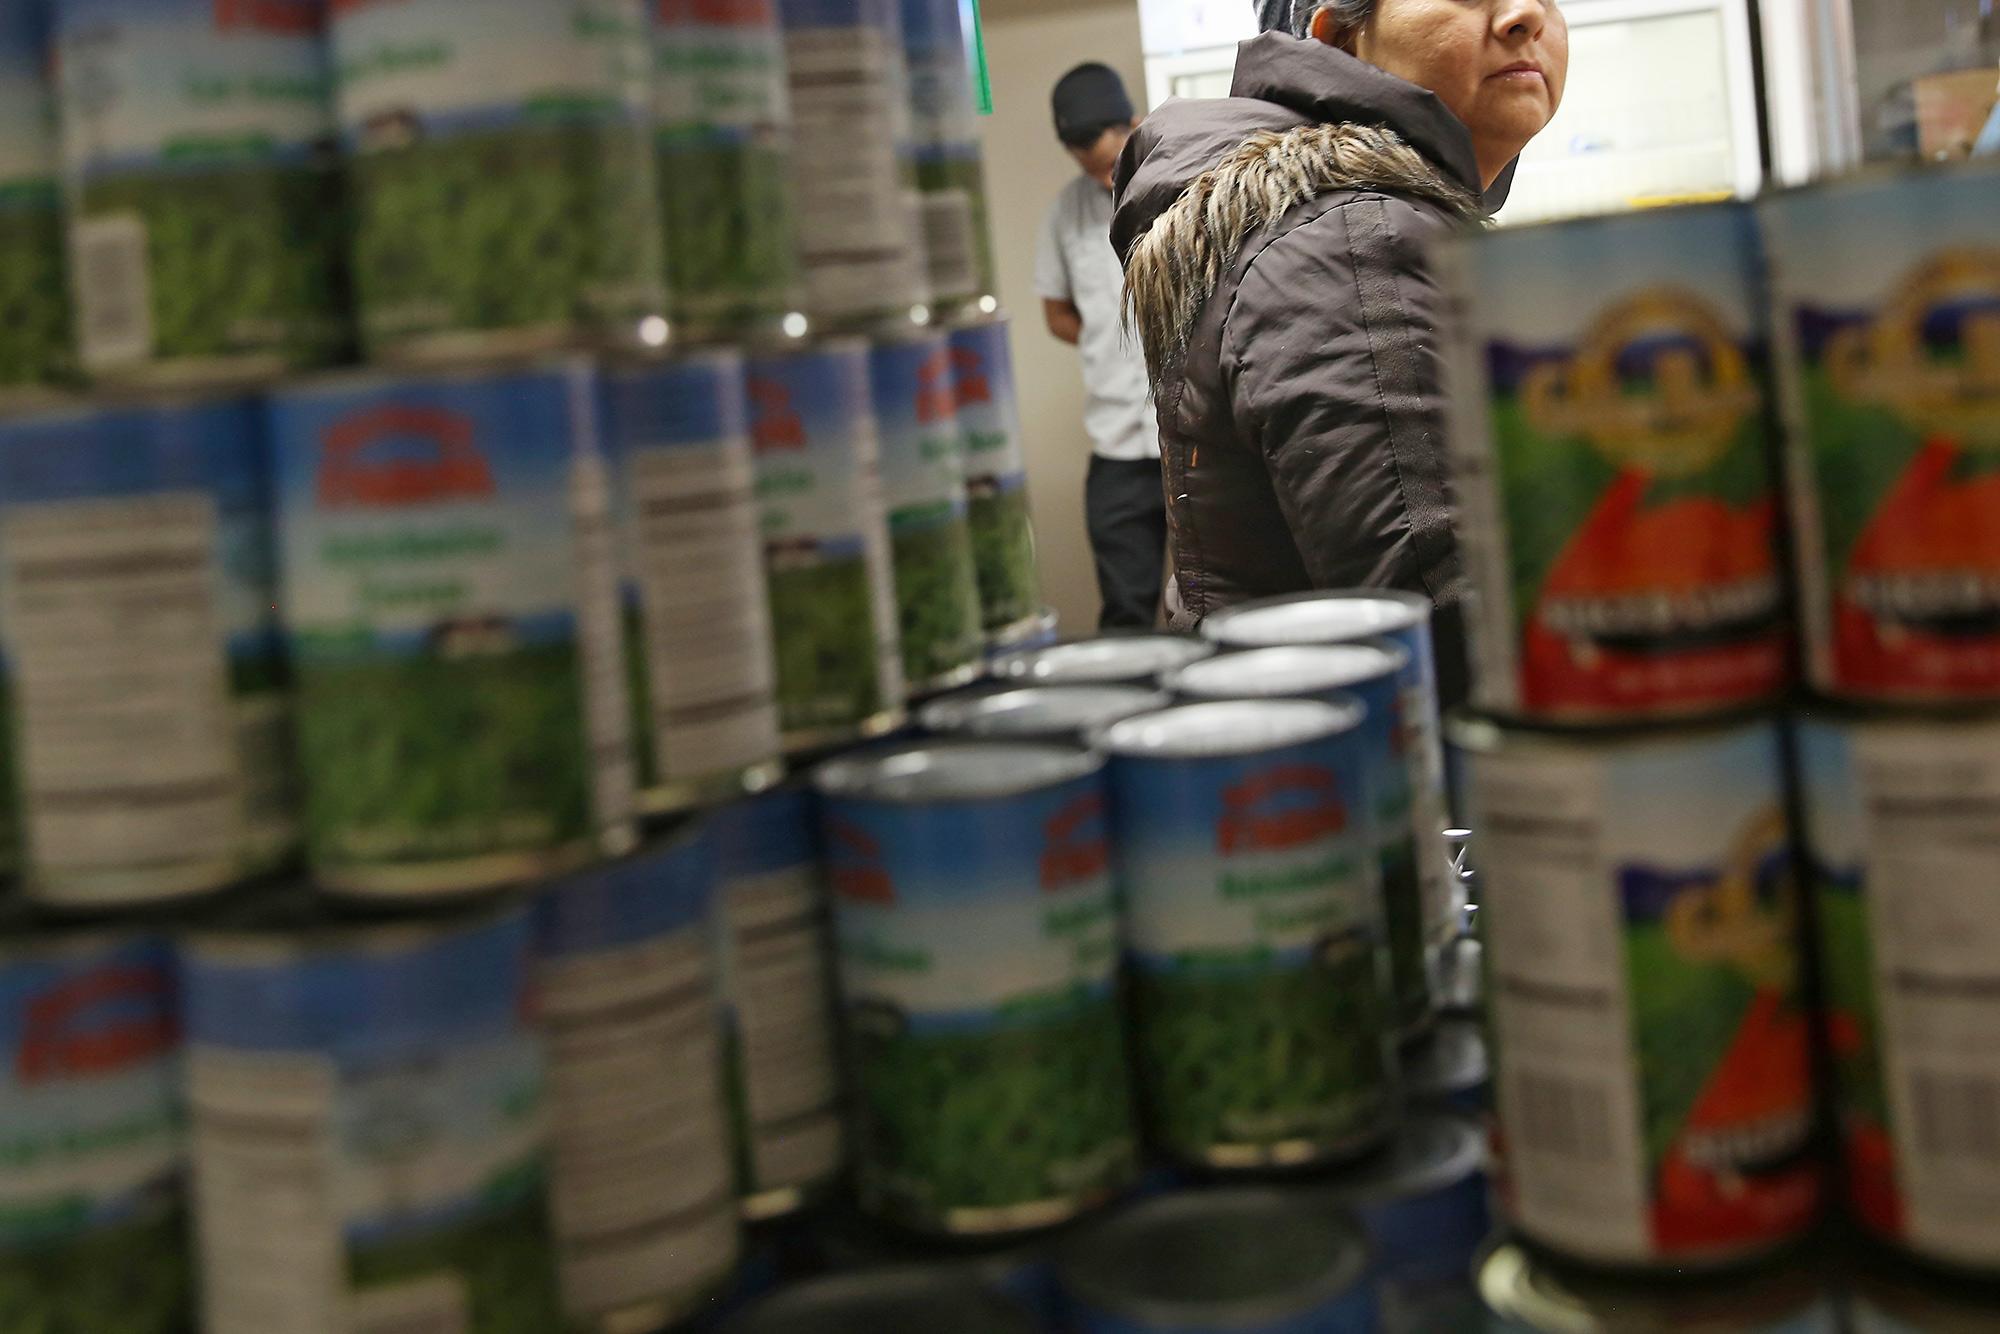 bloomberg.com - Reade Pickert - Food-Stamp Use Is Still at Recession-Era Levels Despite Job Gains